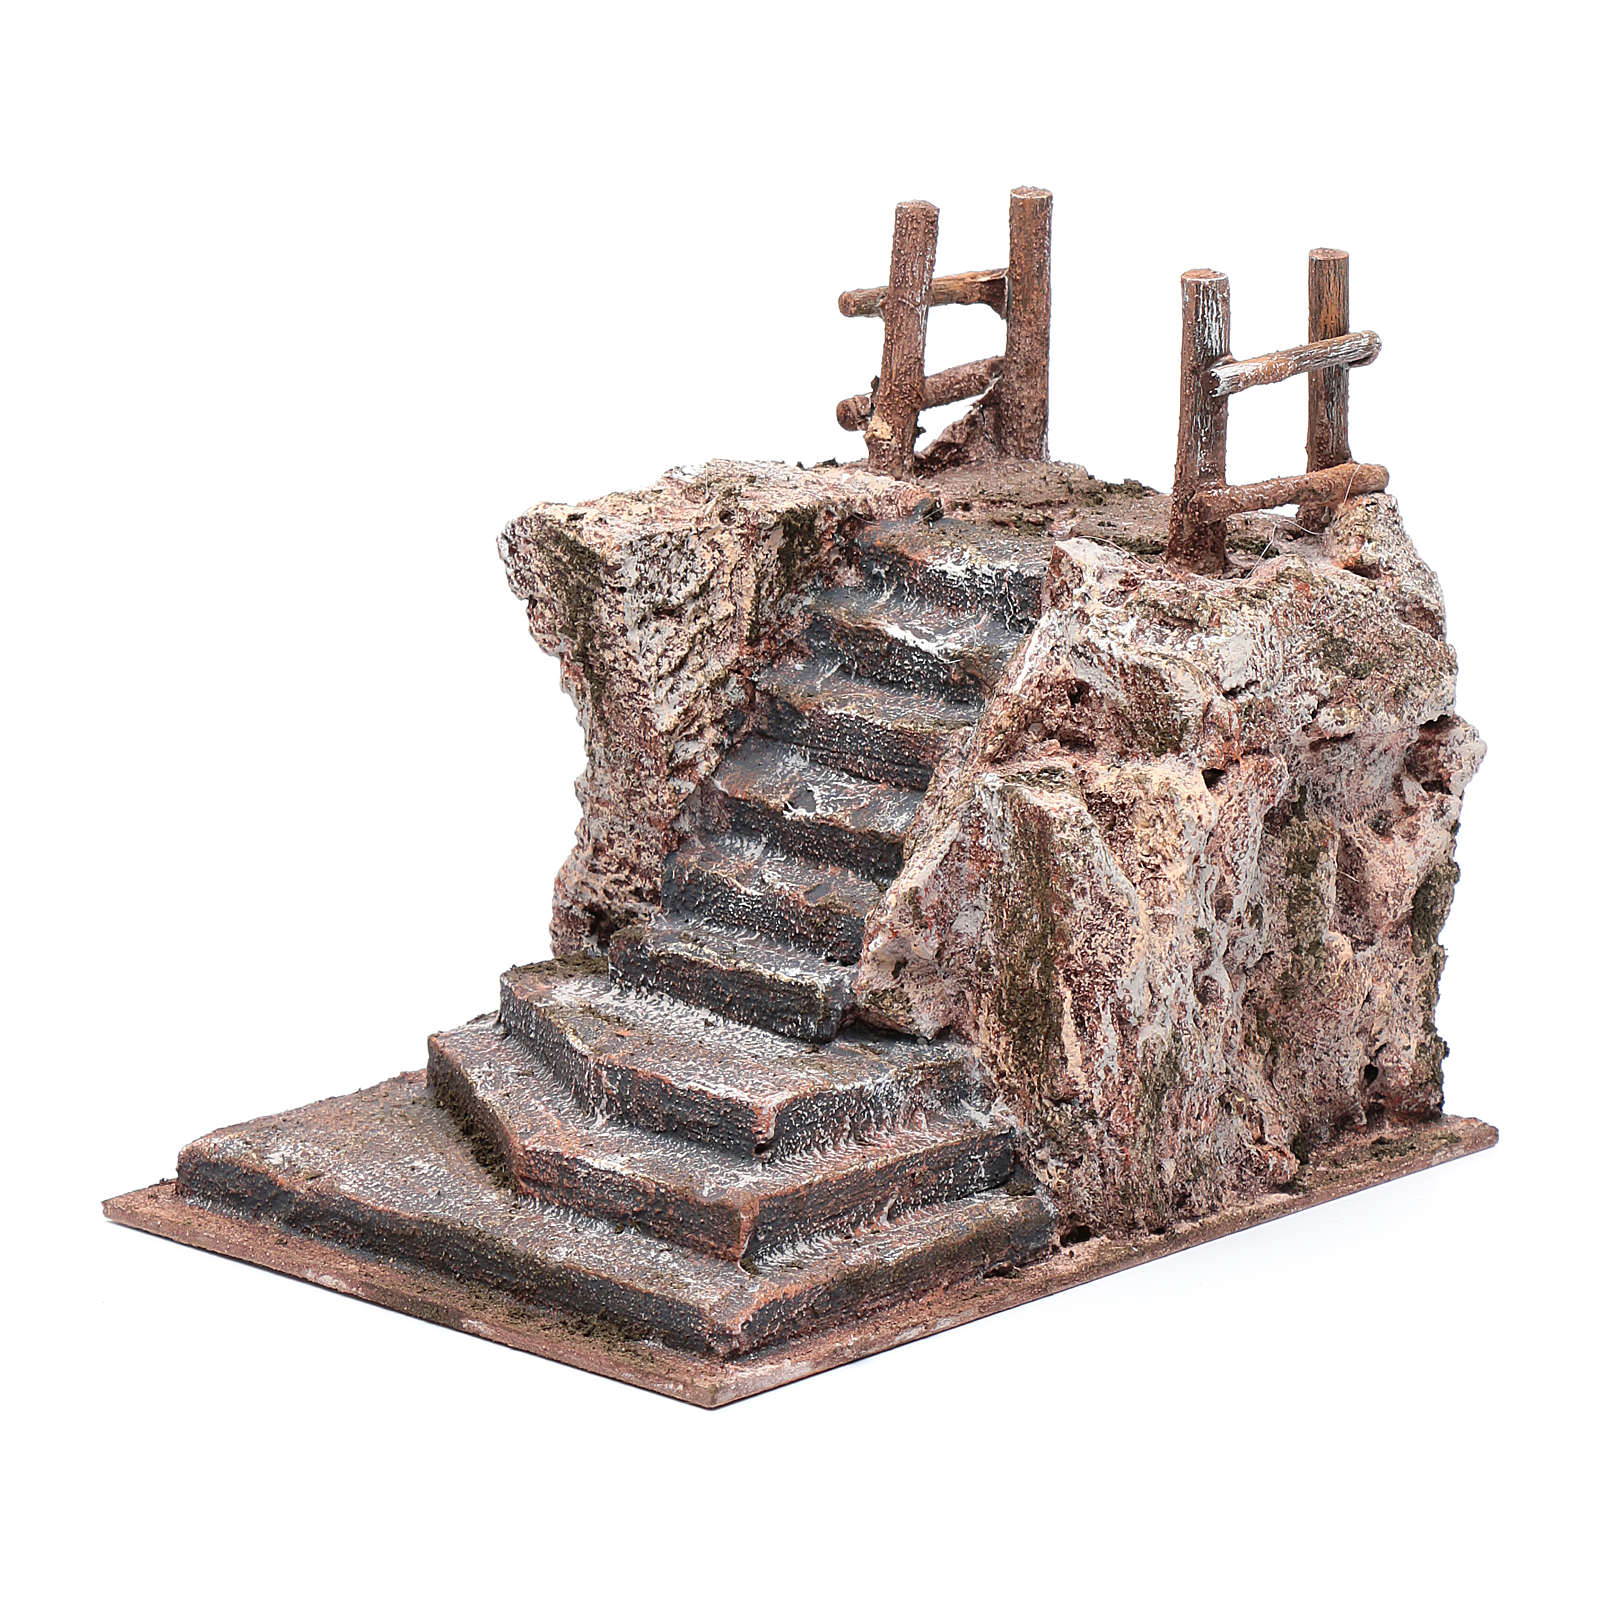 Escalera belén con plaza 15x15x20 cm 4